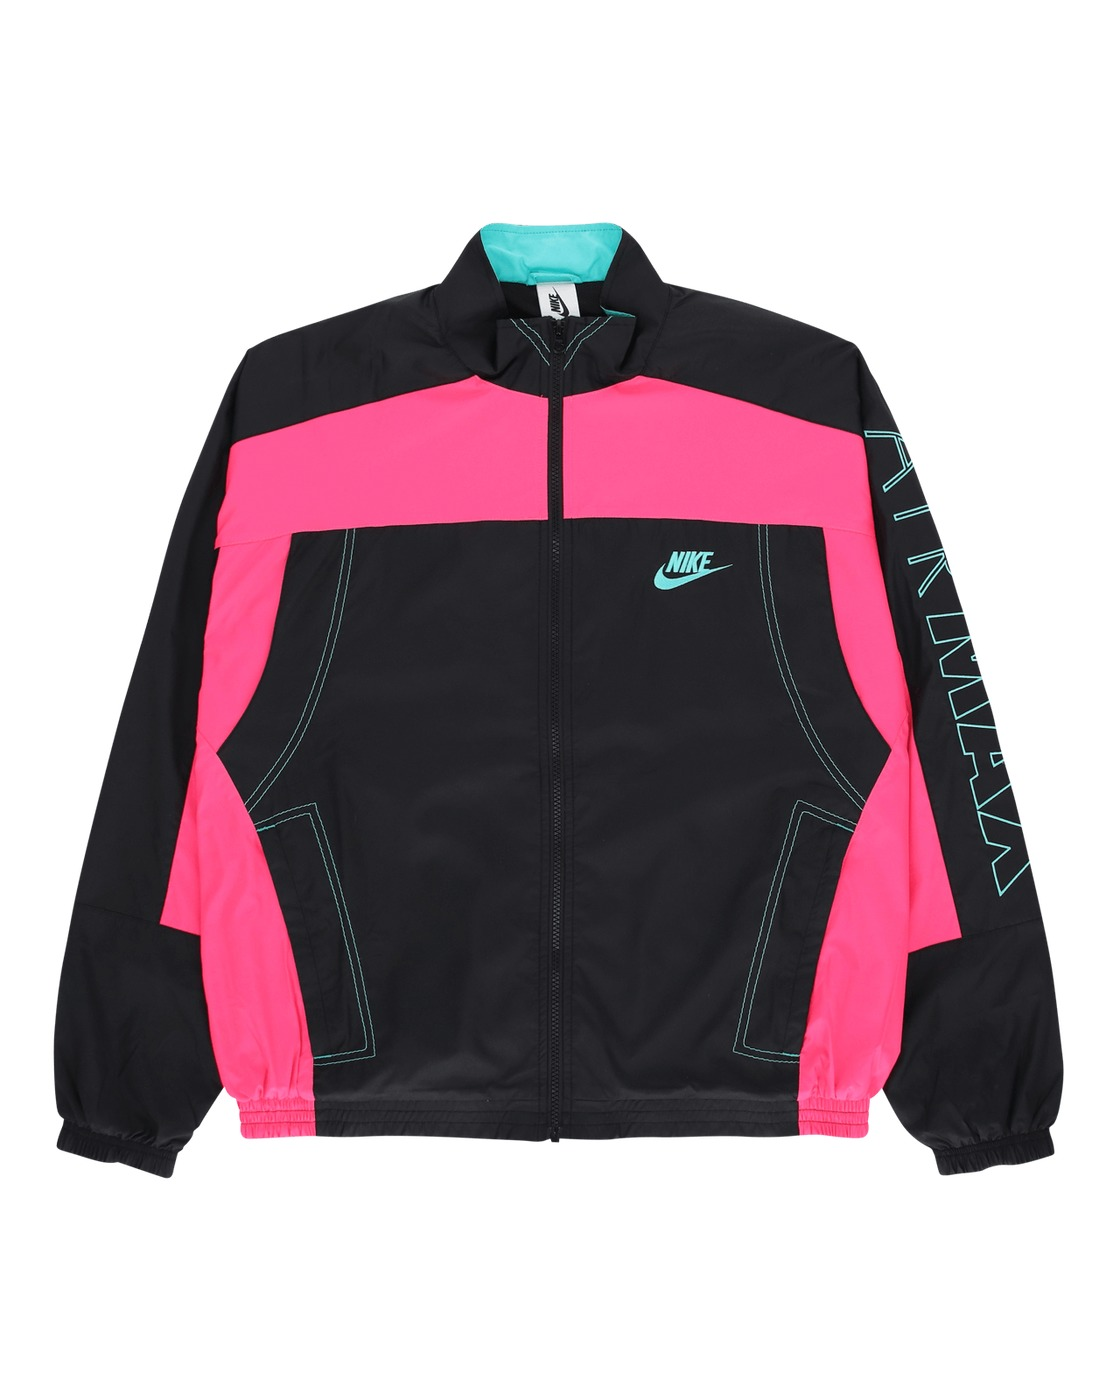 Nike Special Project Atmos Vintage Jacket Black/Hyper Pink